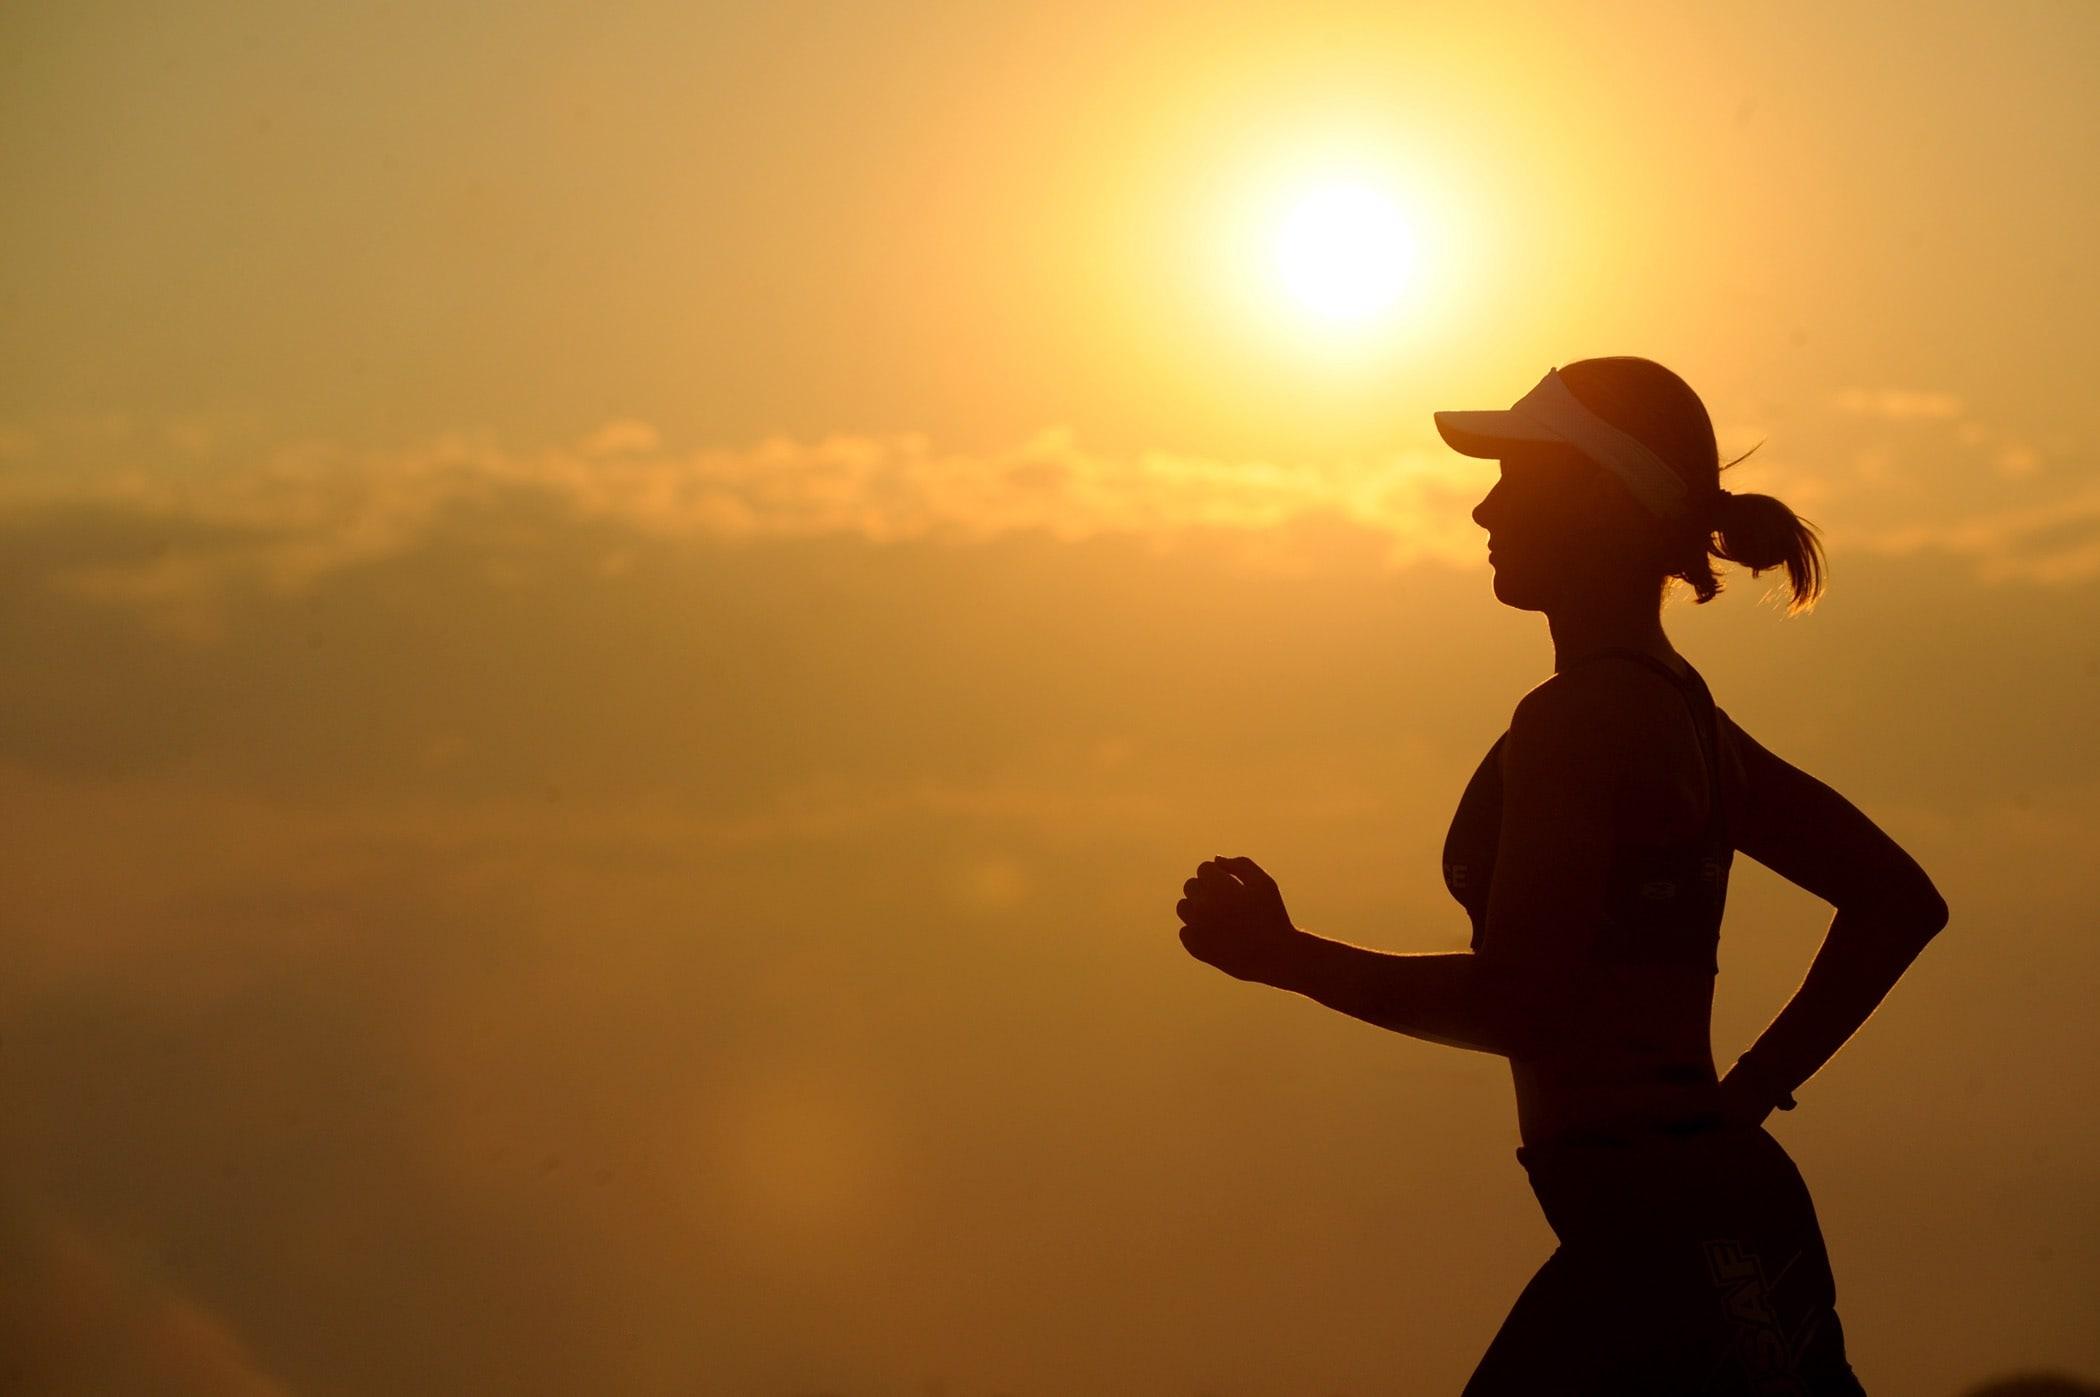 Hacer deporte antes de dormir, ¿sí o no?